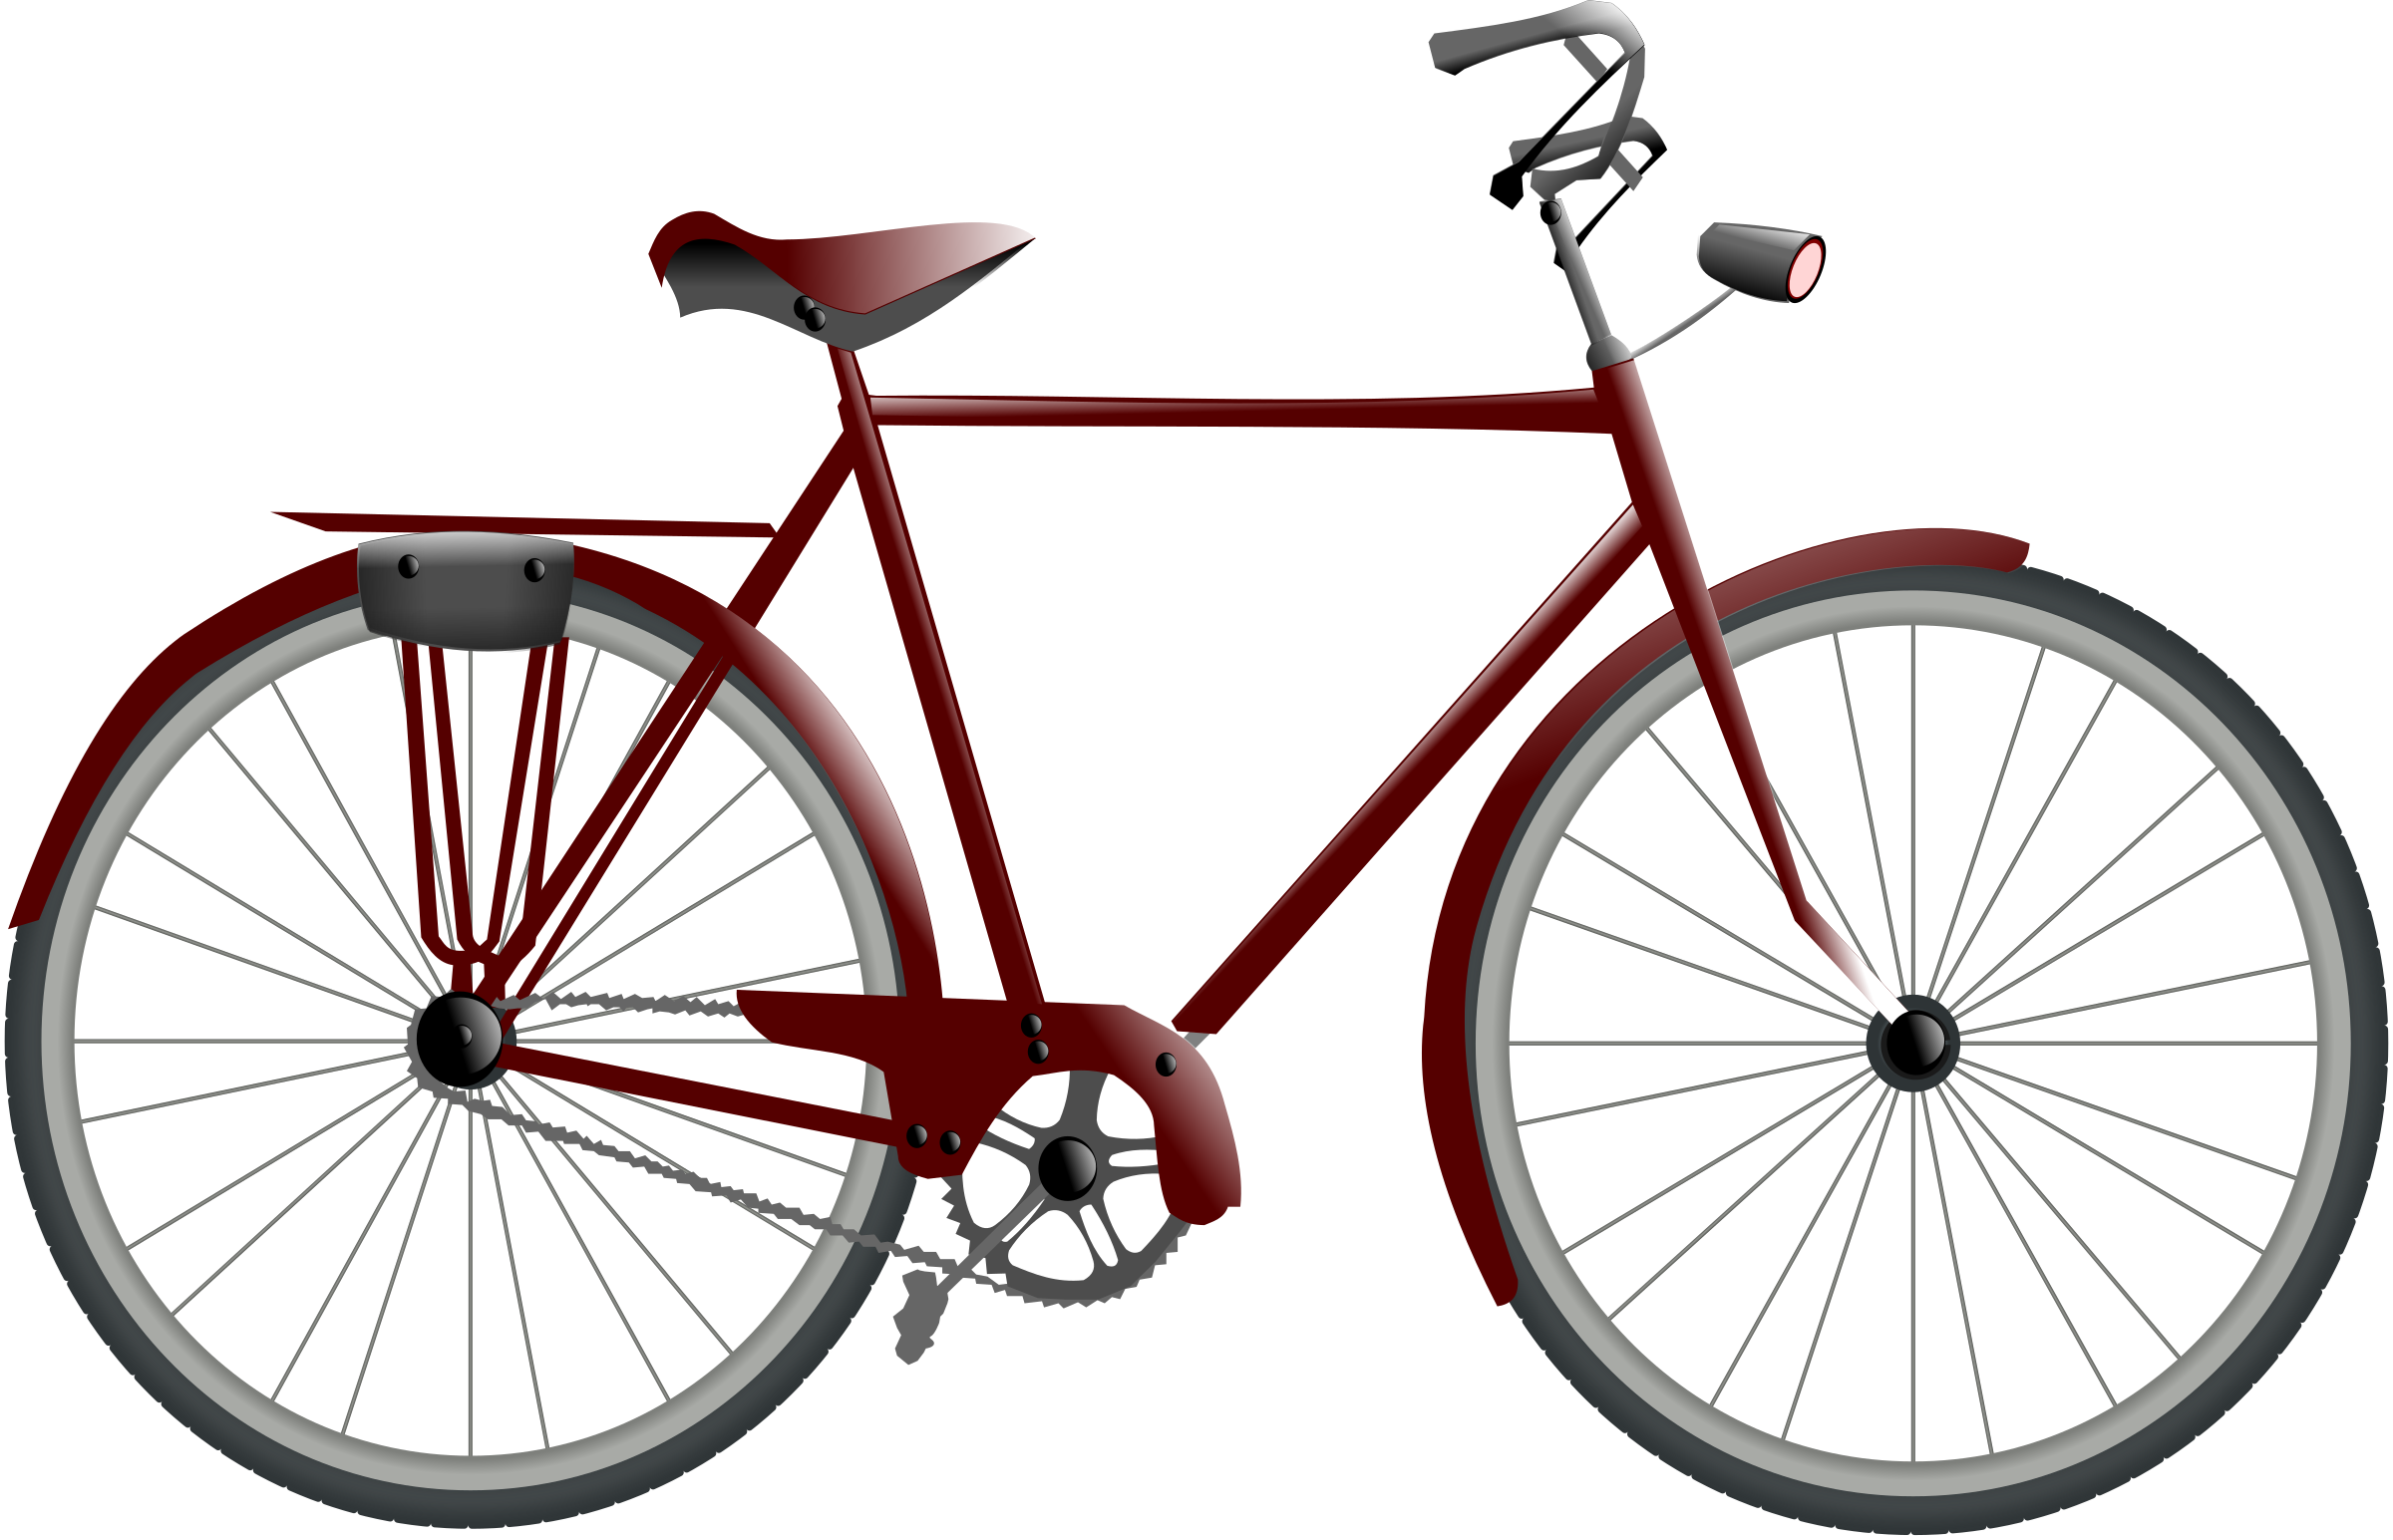 BIG IMAGE (PNG) - Bicycle PNG